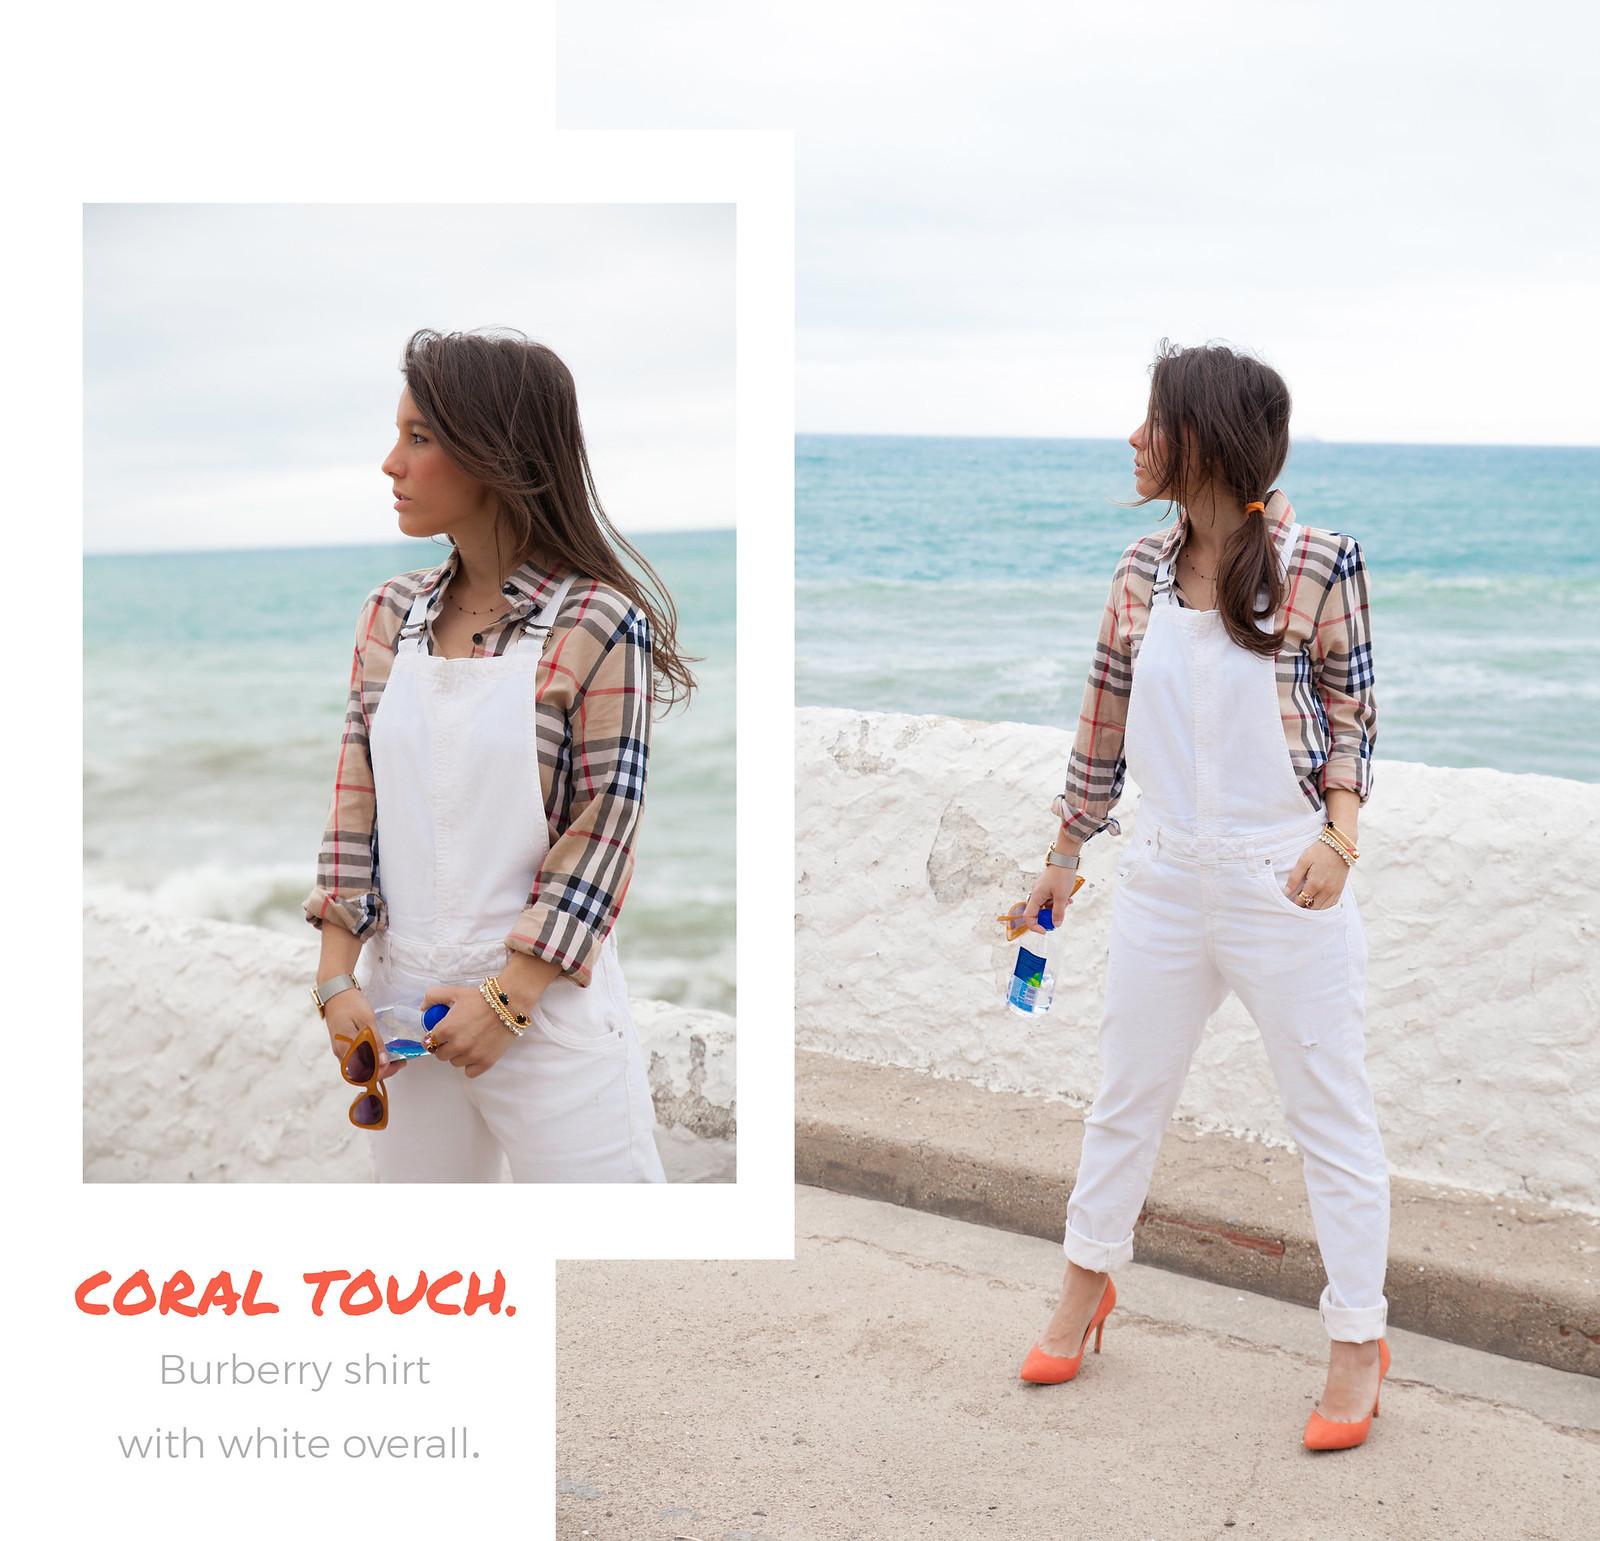 06_Burberry_Outfit_White_overall_Combinar_peto_con_tacones_mas34_theguestgirl_influencer_barcelona